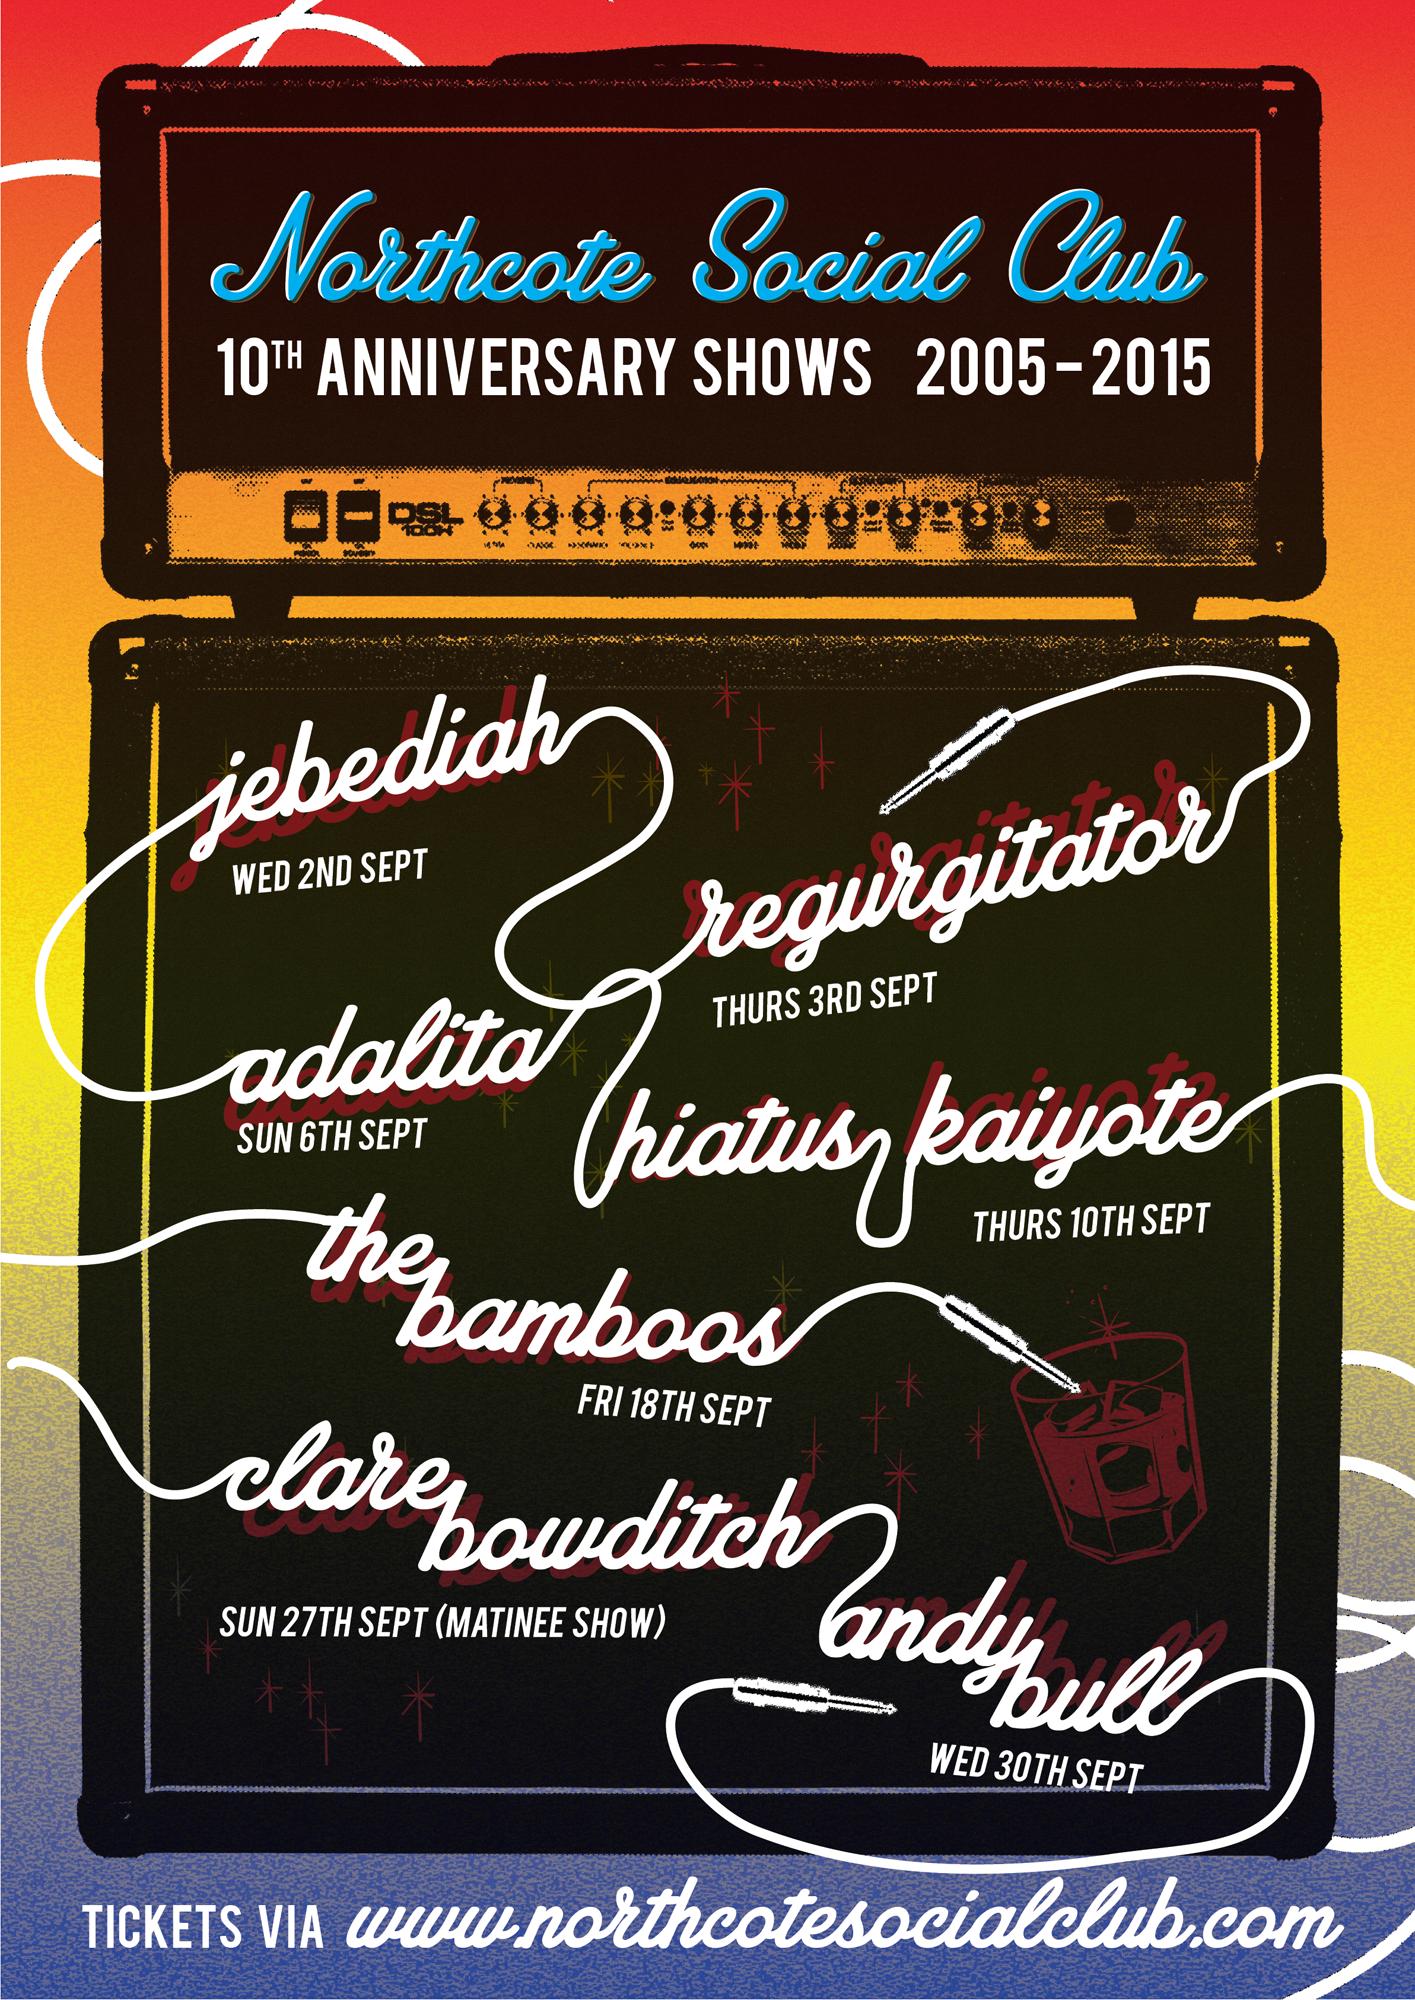 Northcote SC 10th anniversary poster.jpg